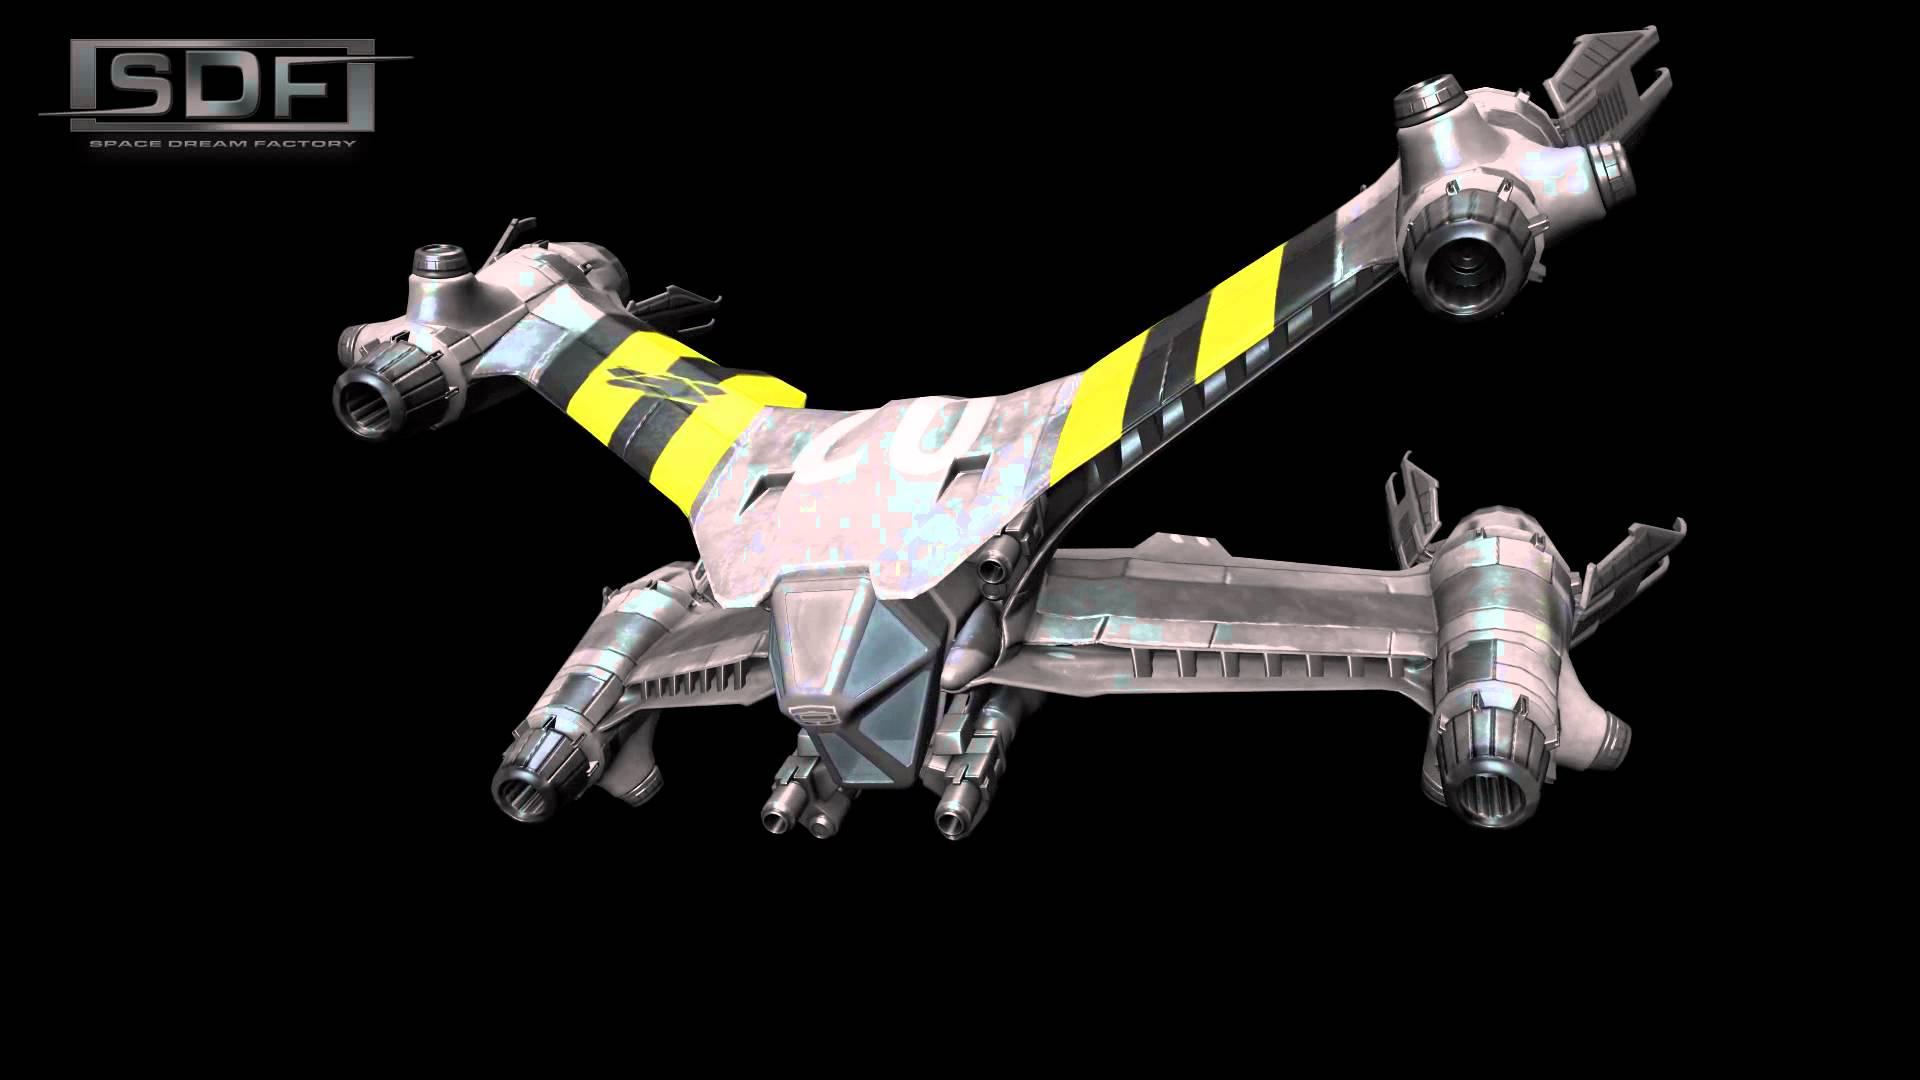 5_1491682944118_thdrtop_sm.gif 4_1491682944118_starfury-fighter.jpg 3_1491682944118_maxresdefault.jpg